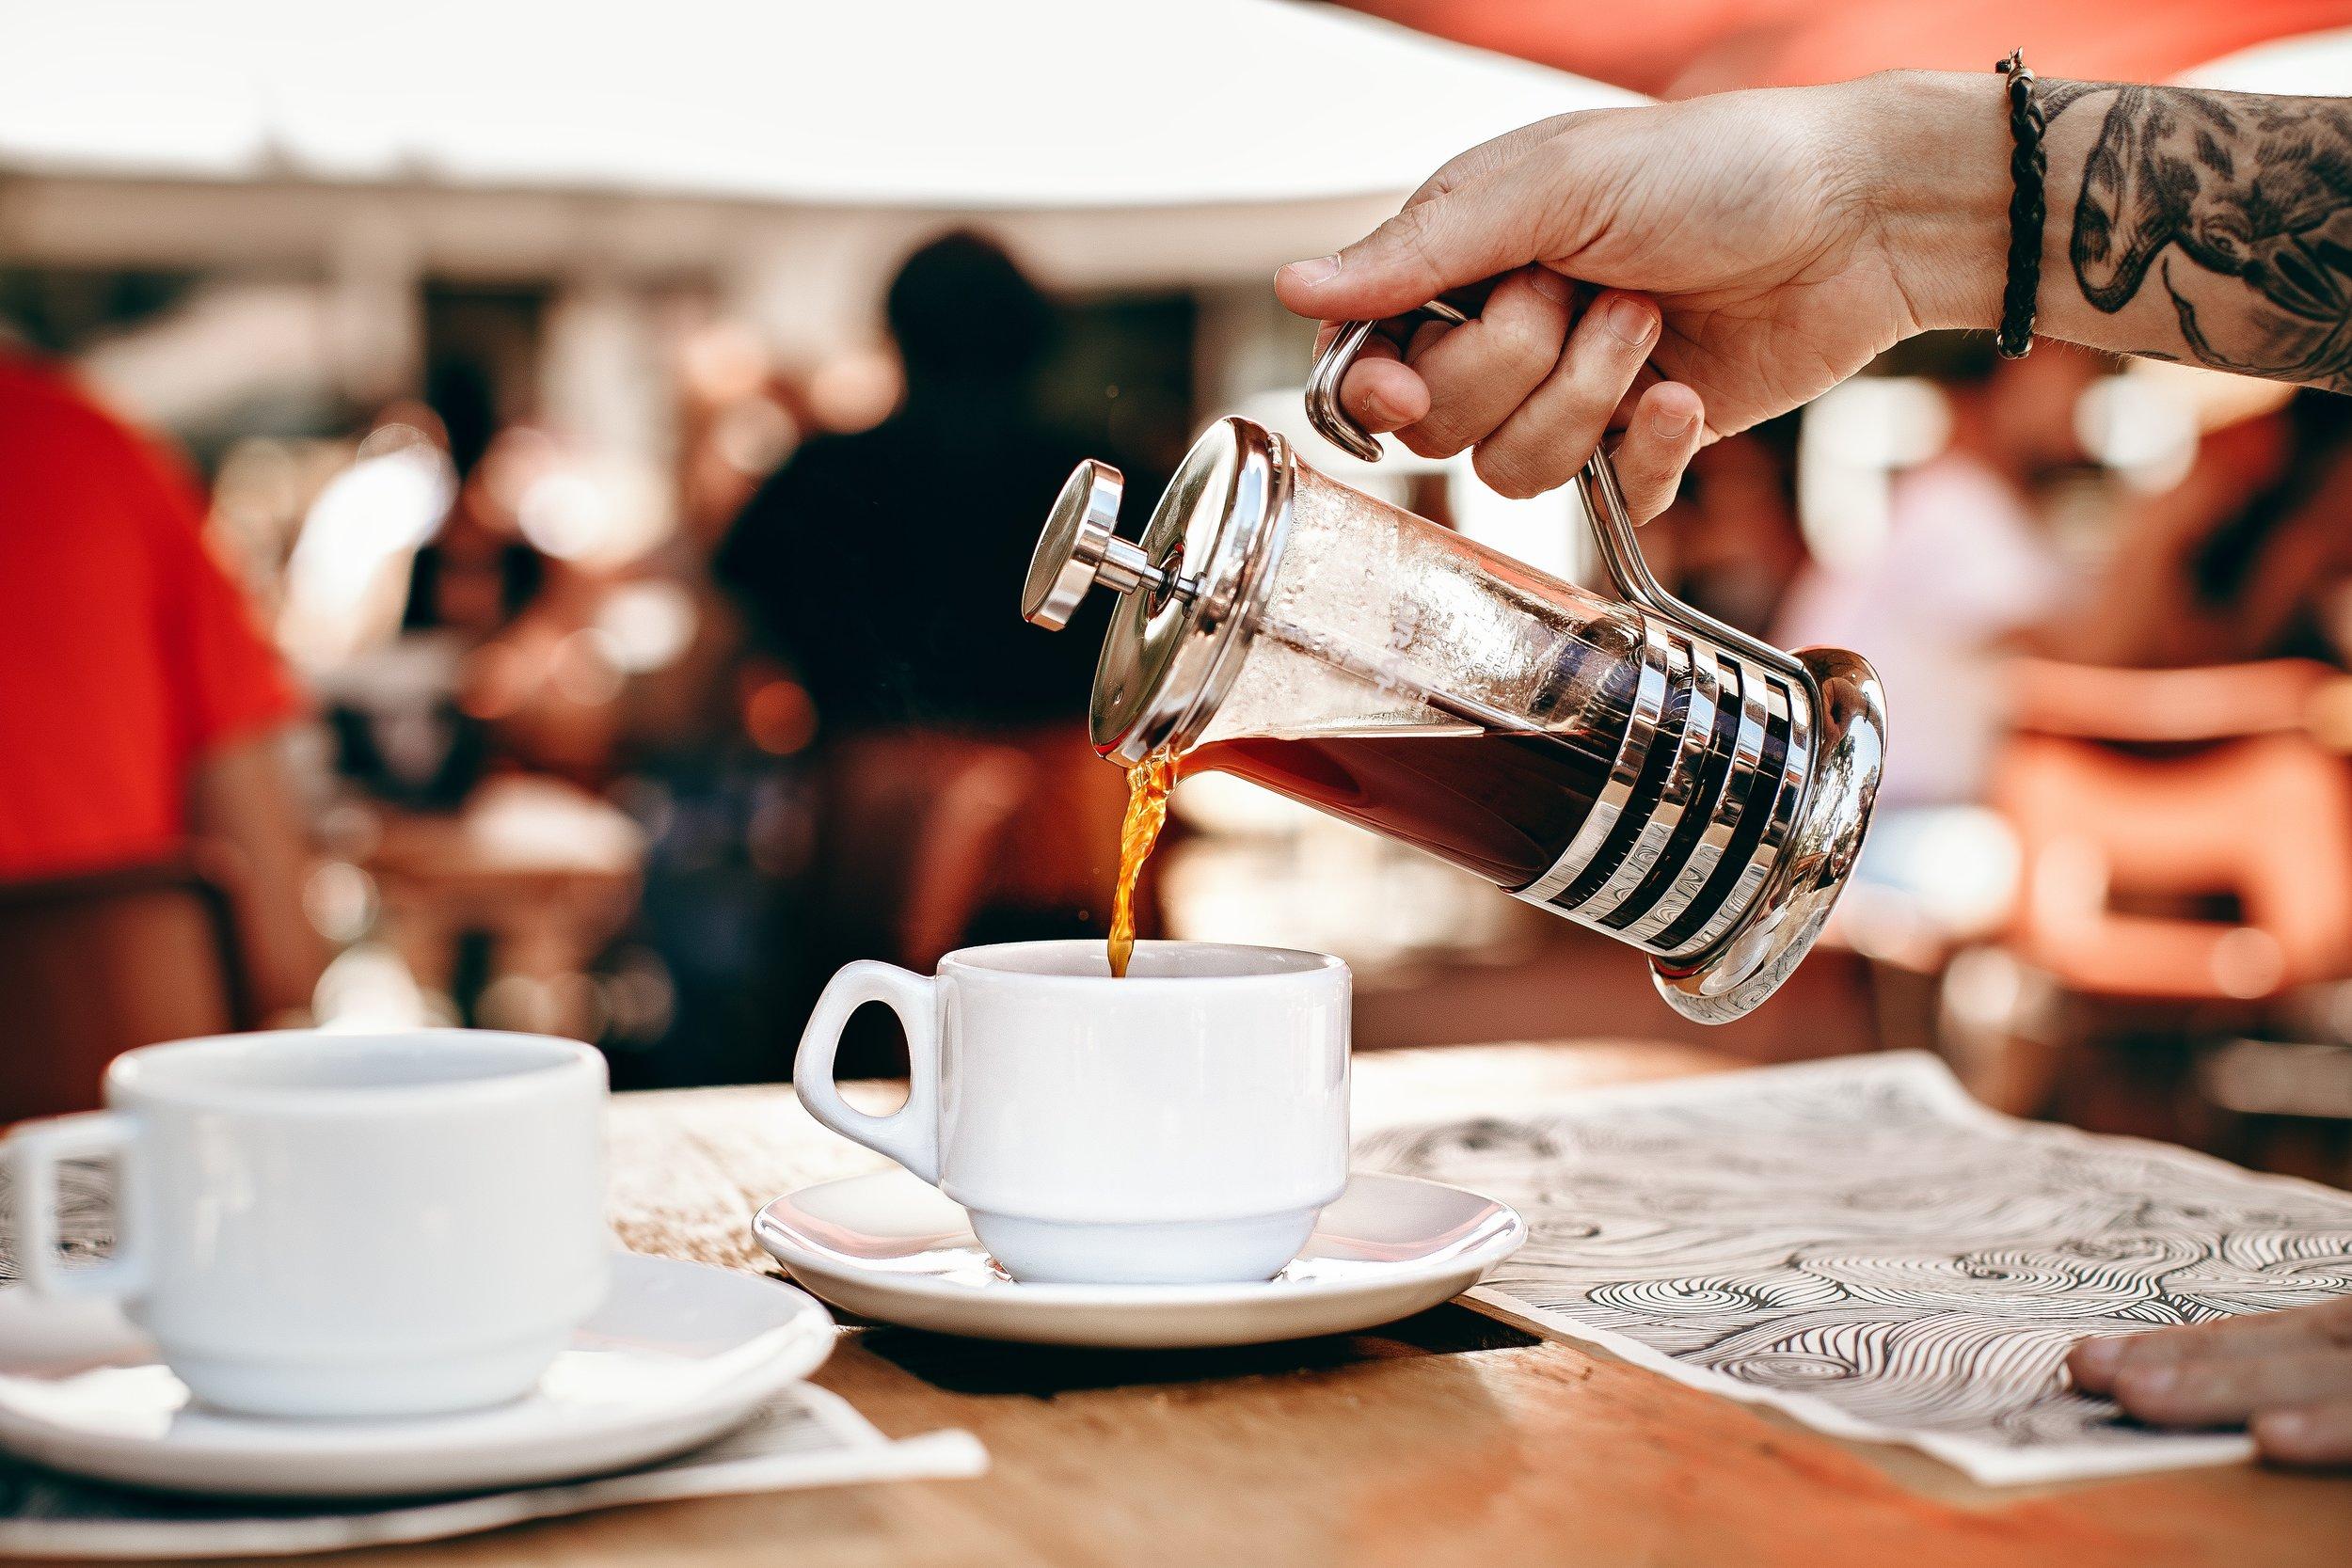 aroma-barista-blurred-background-1394841.jpg